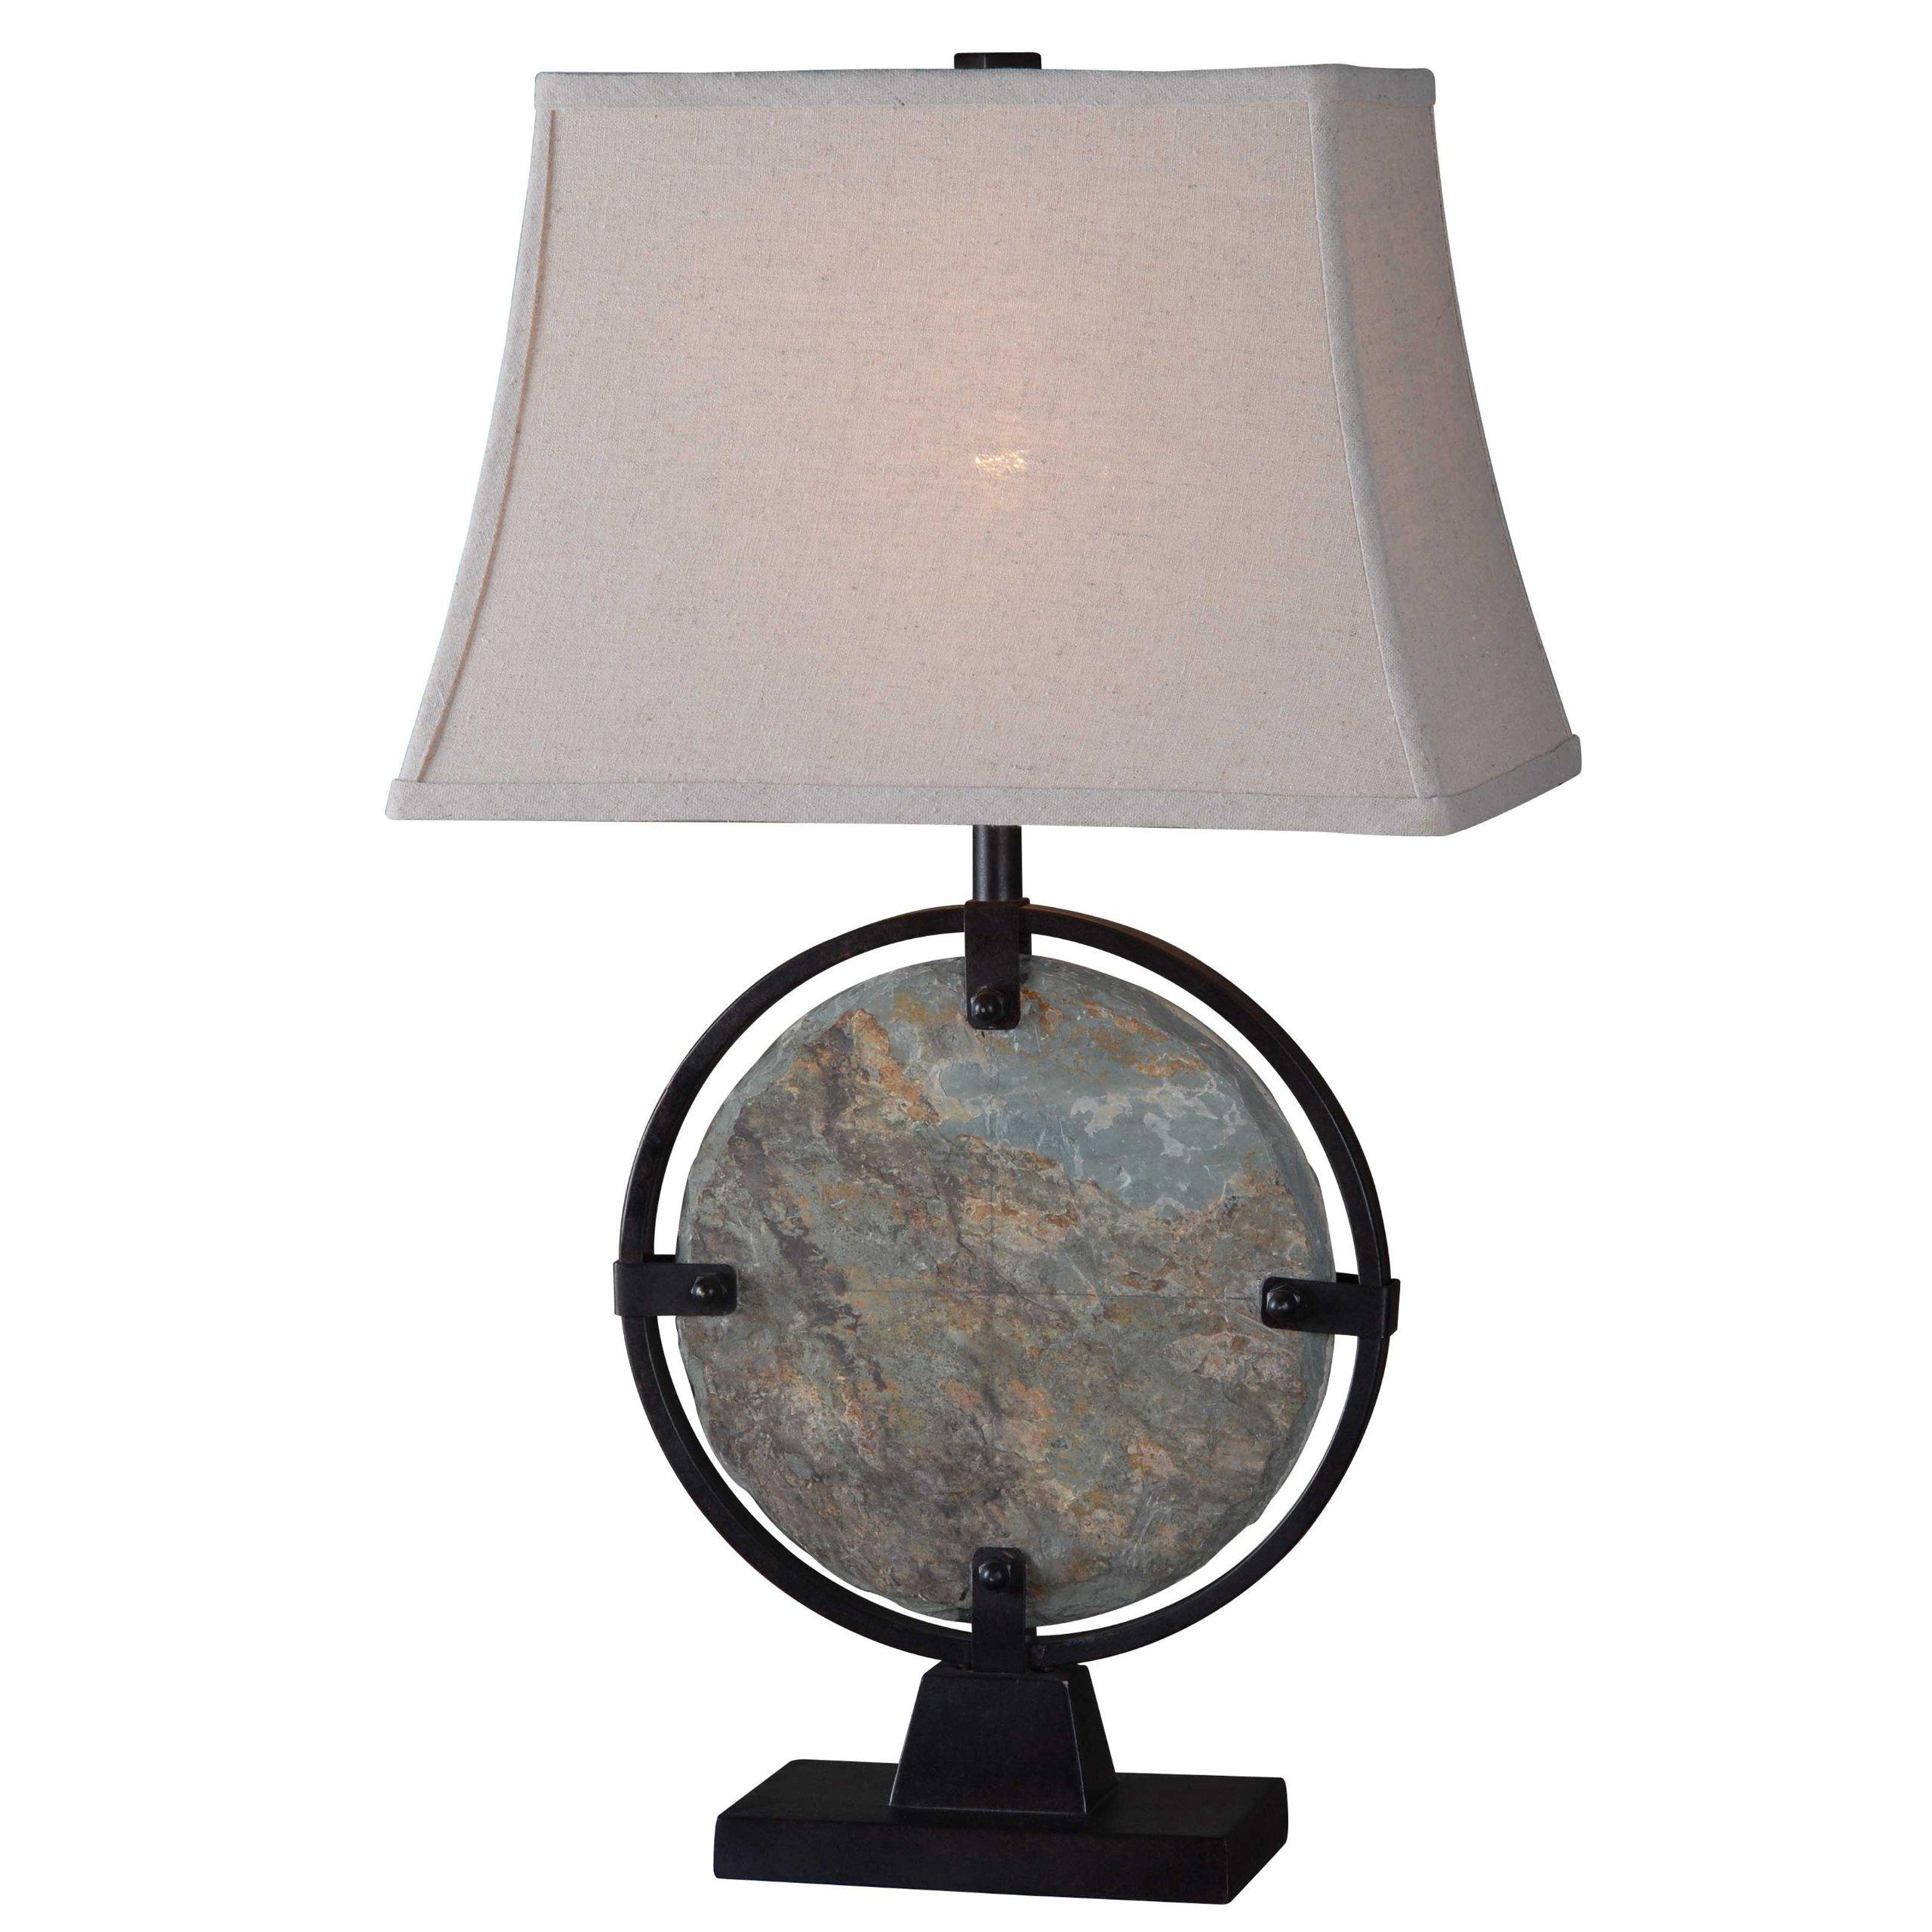 Kenroy Home 32226SL Suspension Table Lamp, Natural Slate by Kenroy Home (Image #1)